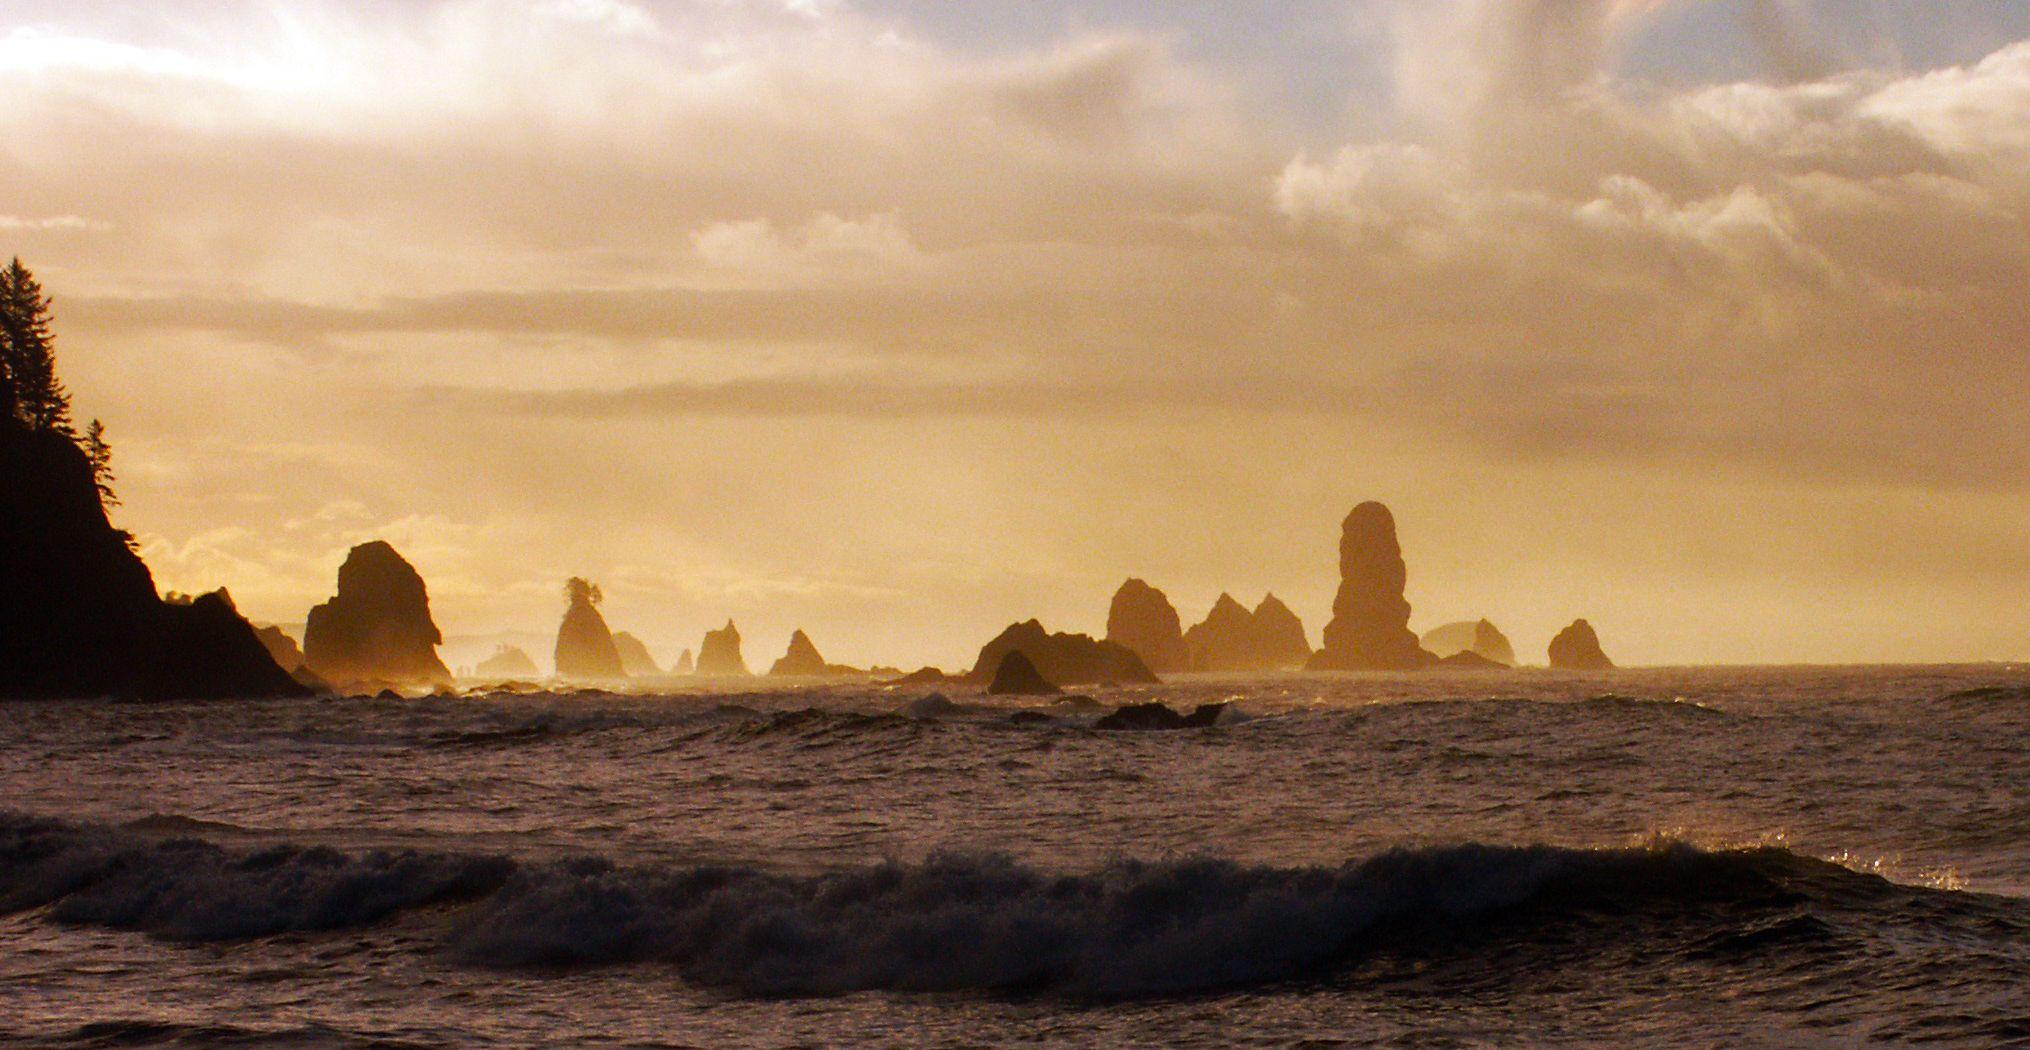 Third beach giants graveyard la push travel pinterest third beach giants graveyard la push nvjuhfo Gallery